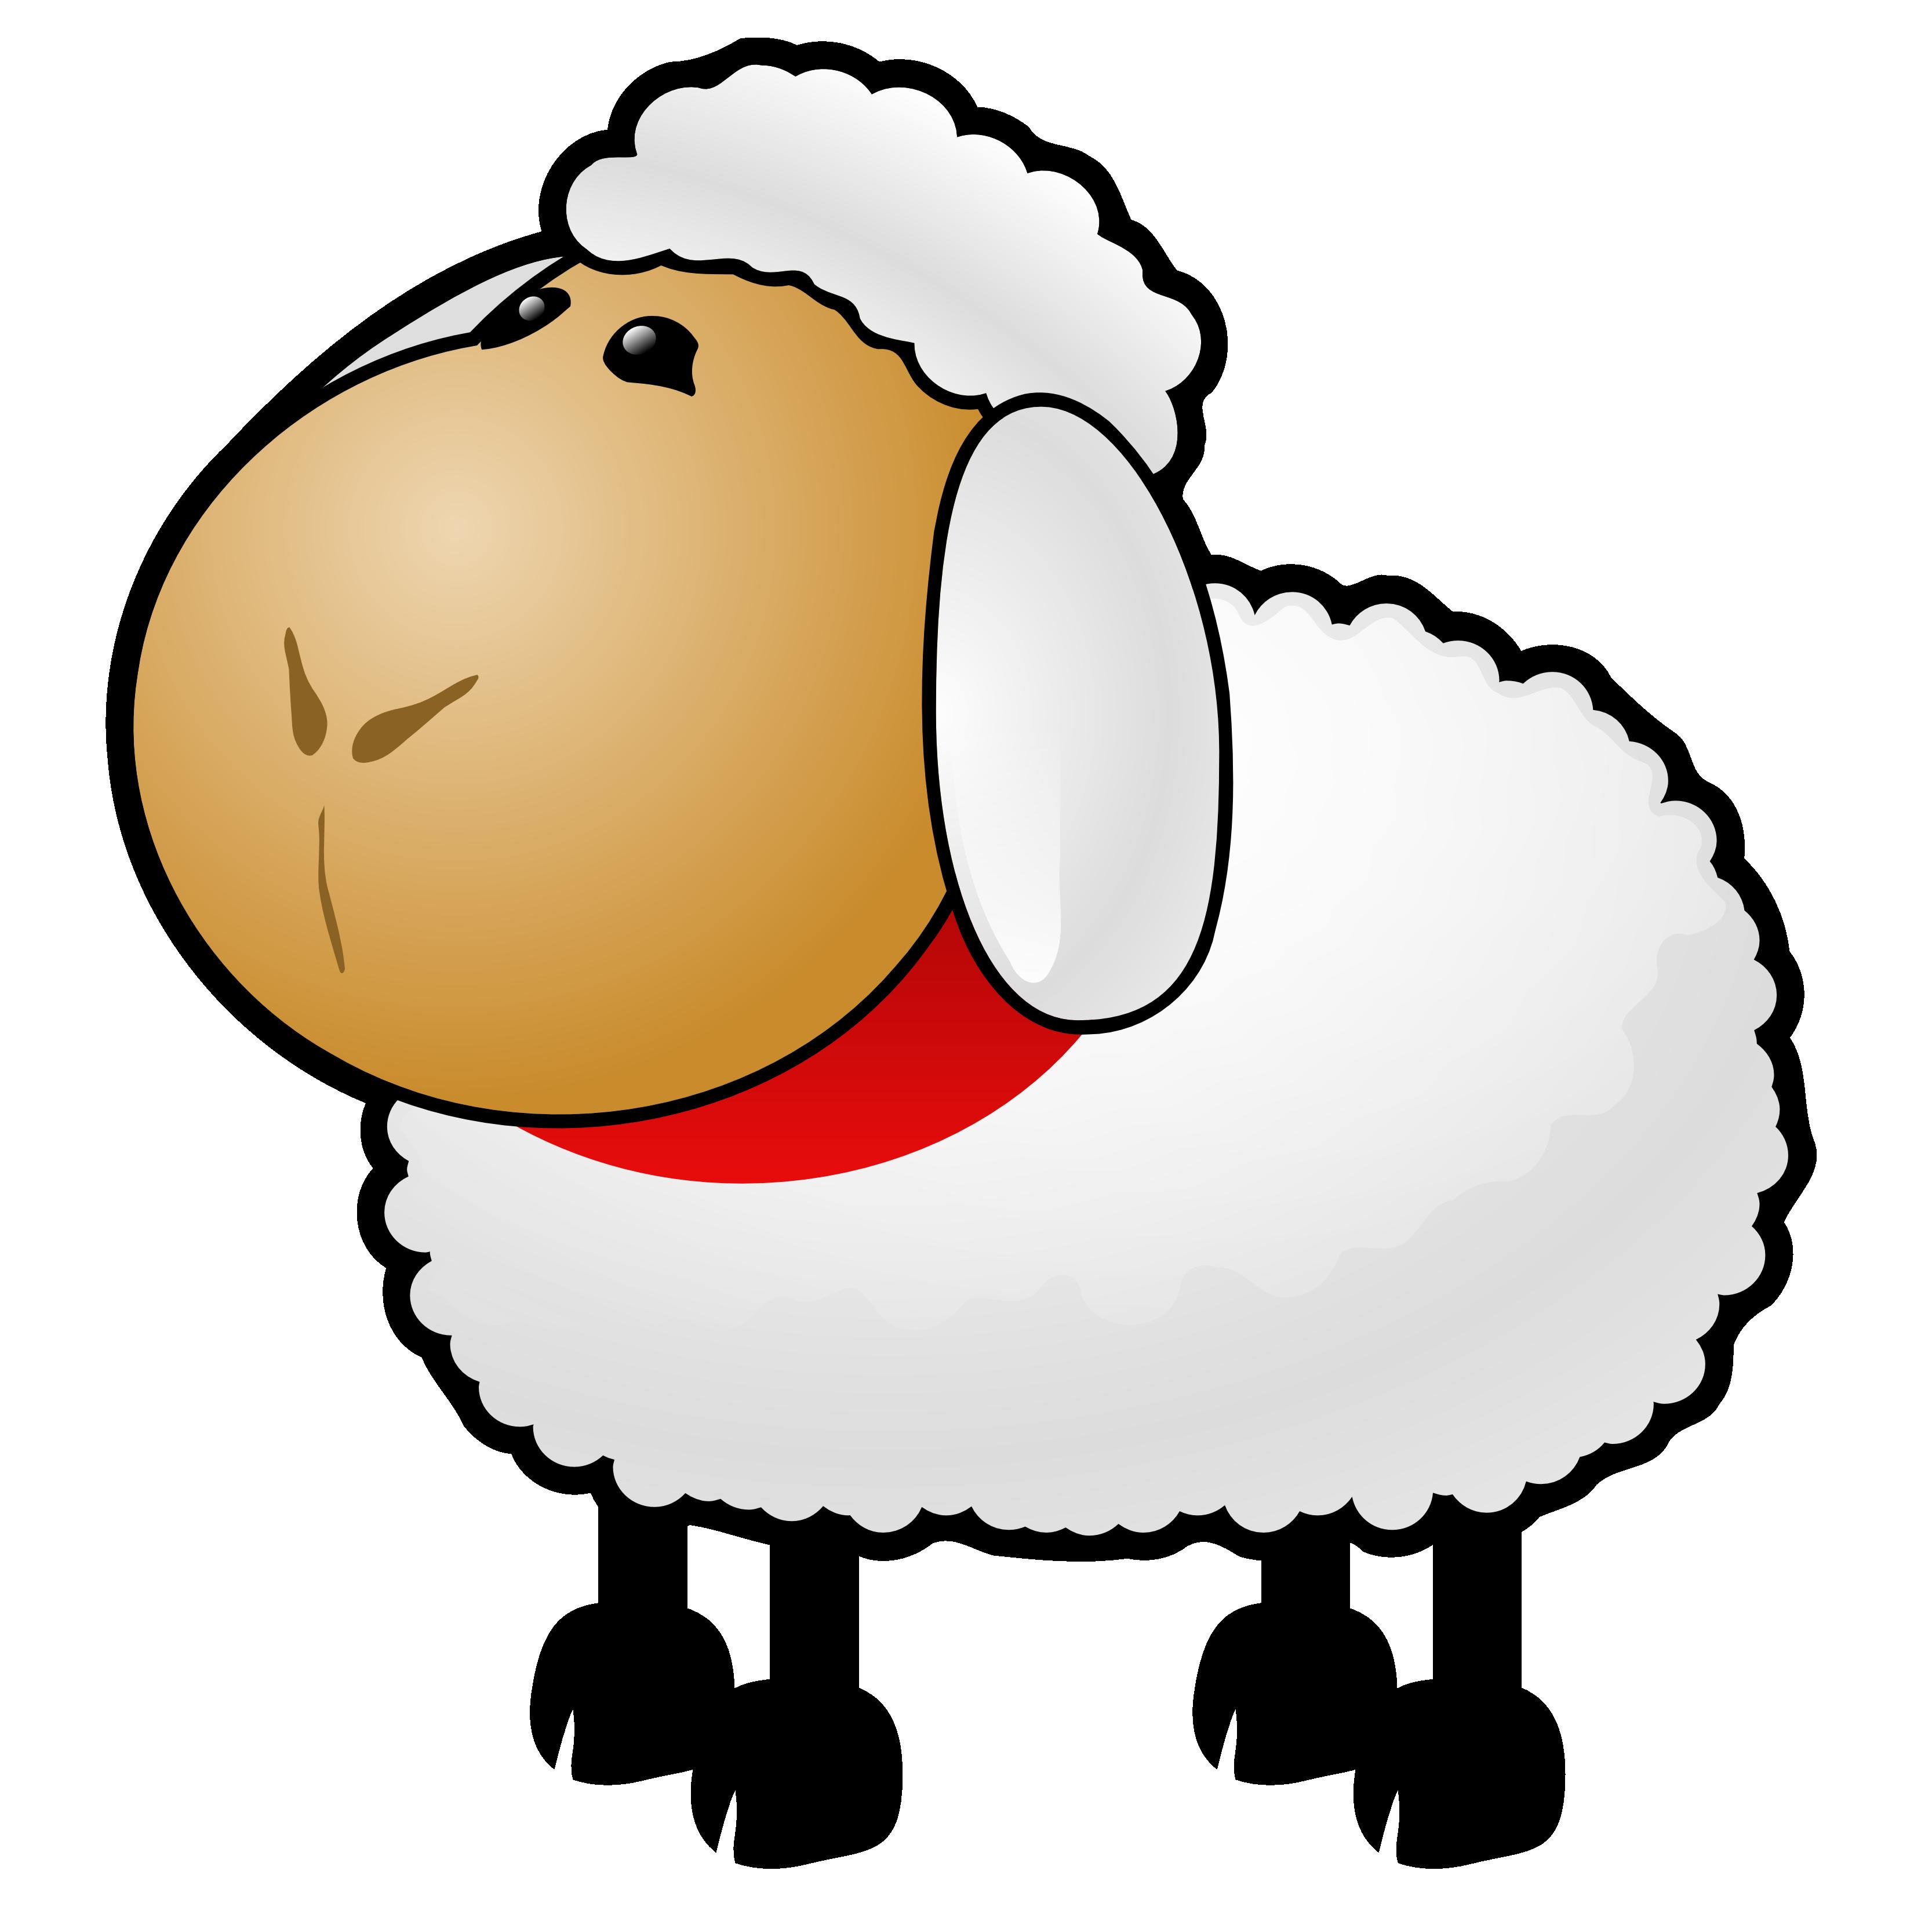 Lamb and cross clipart jpg royalty free library Free Sheep Clipart   Free Download Clip Art   Free Clip Art   on ... jpg royalty free library